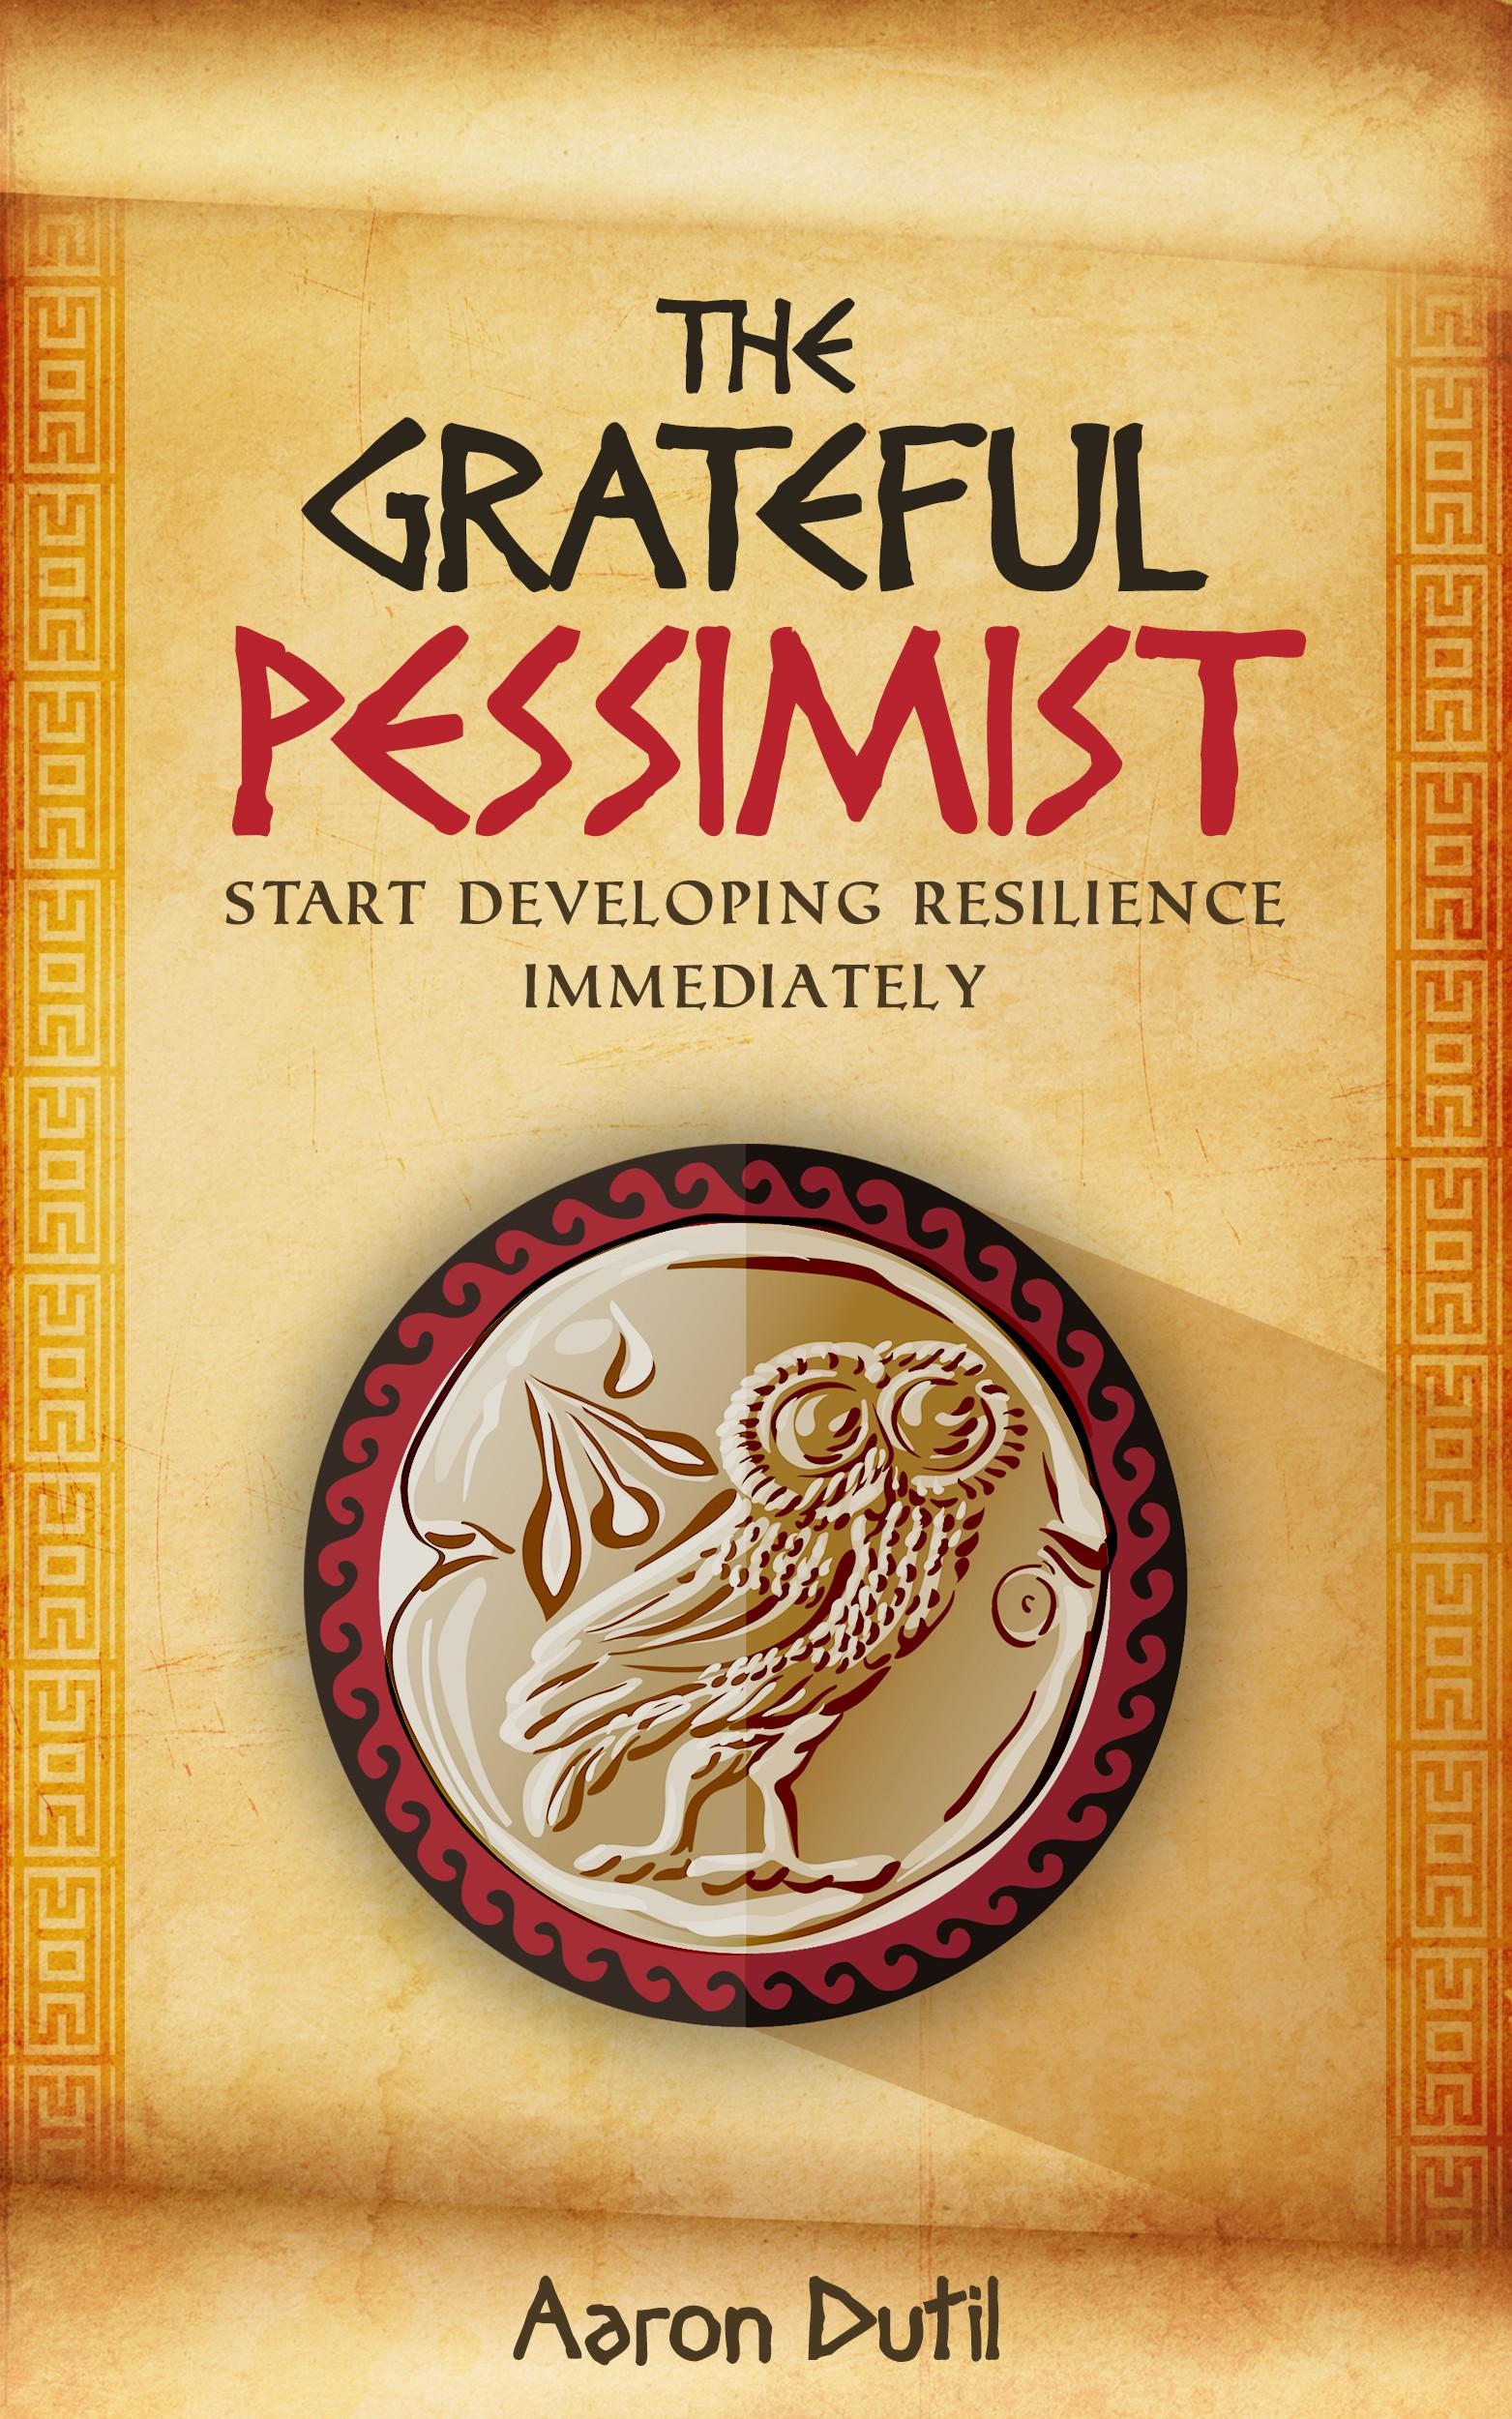 Book cover design for self-help book using ancient Greco-Roman design.